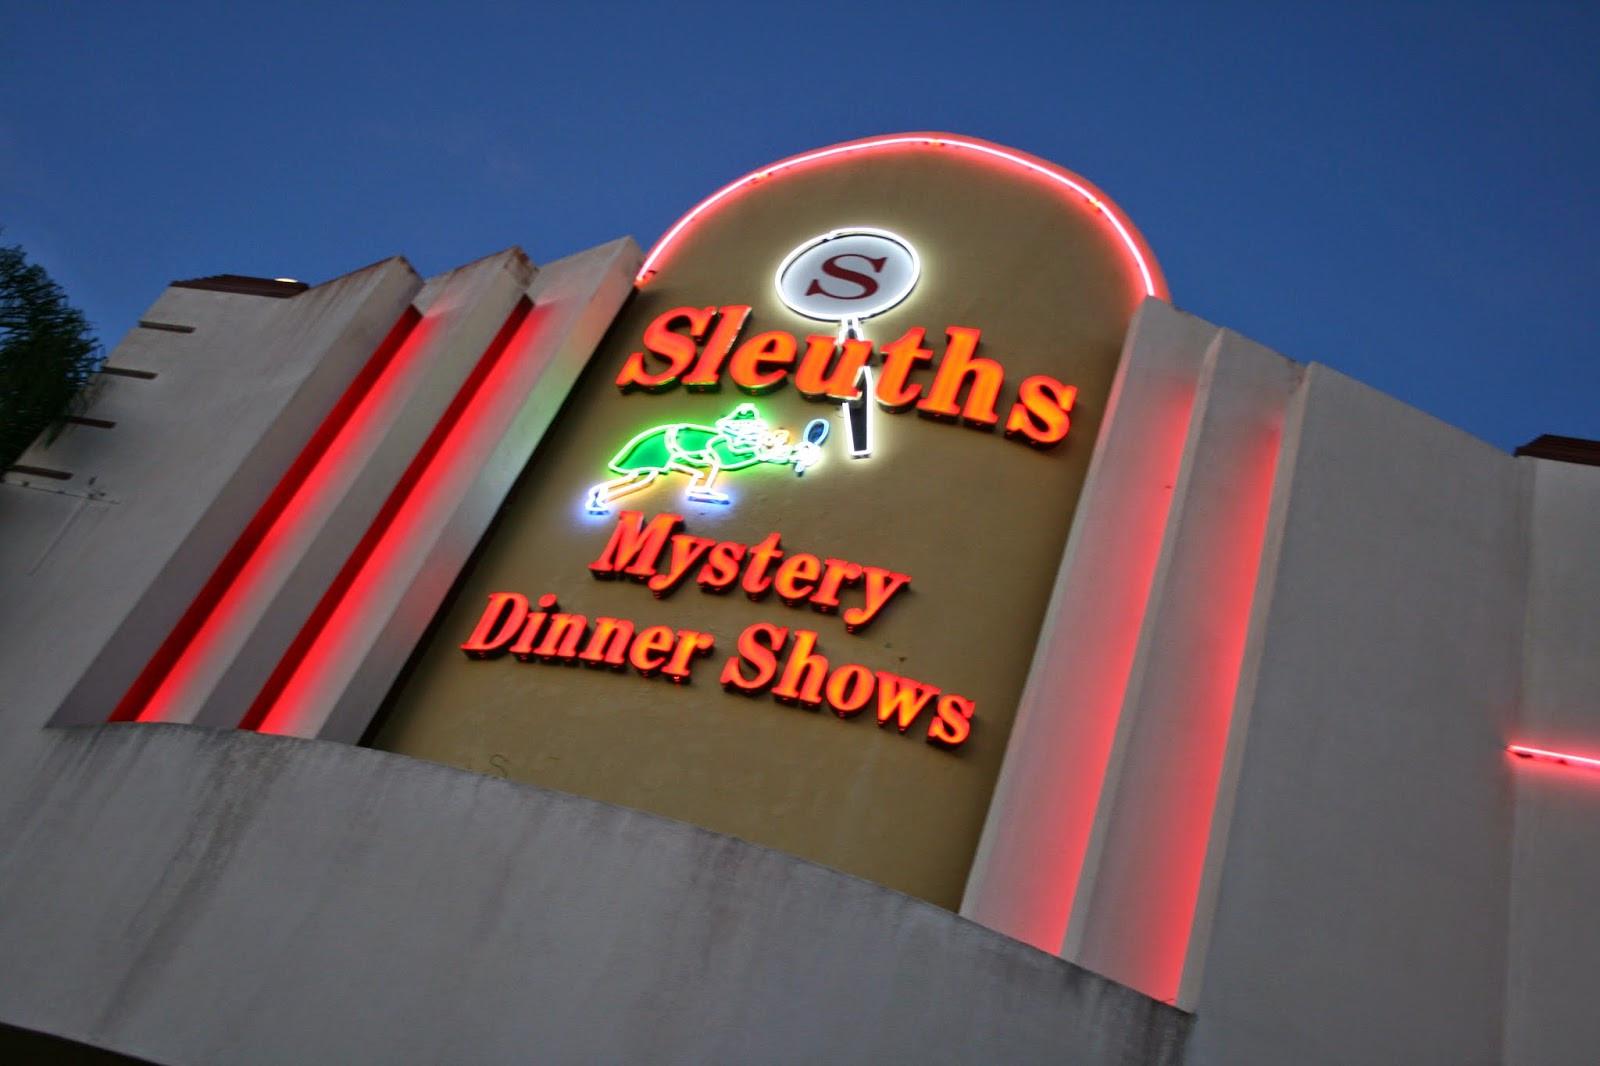 Sleuths Mystery Dinner Shows  Sleuths Mystery Dinner Shows Orlando